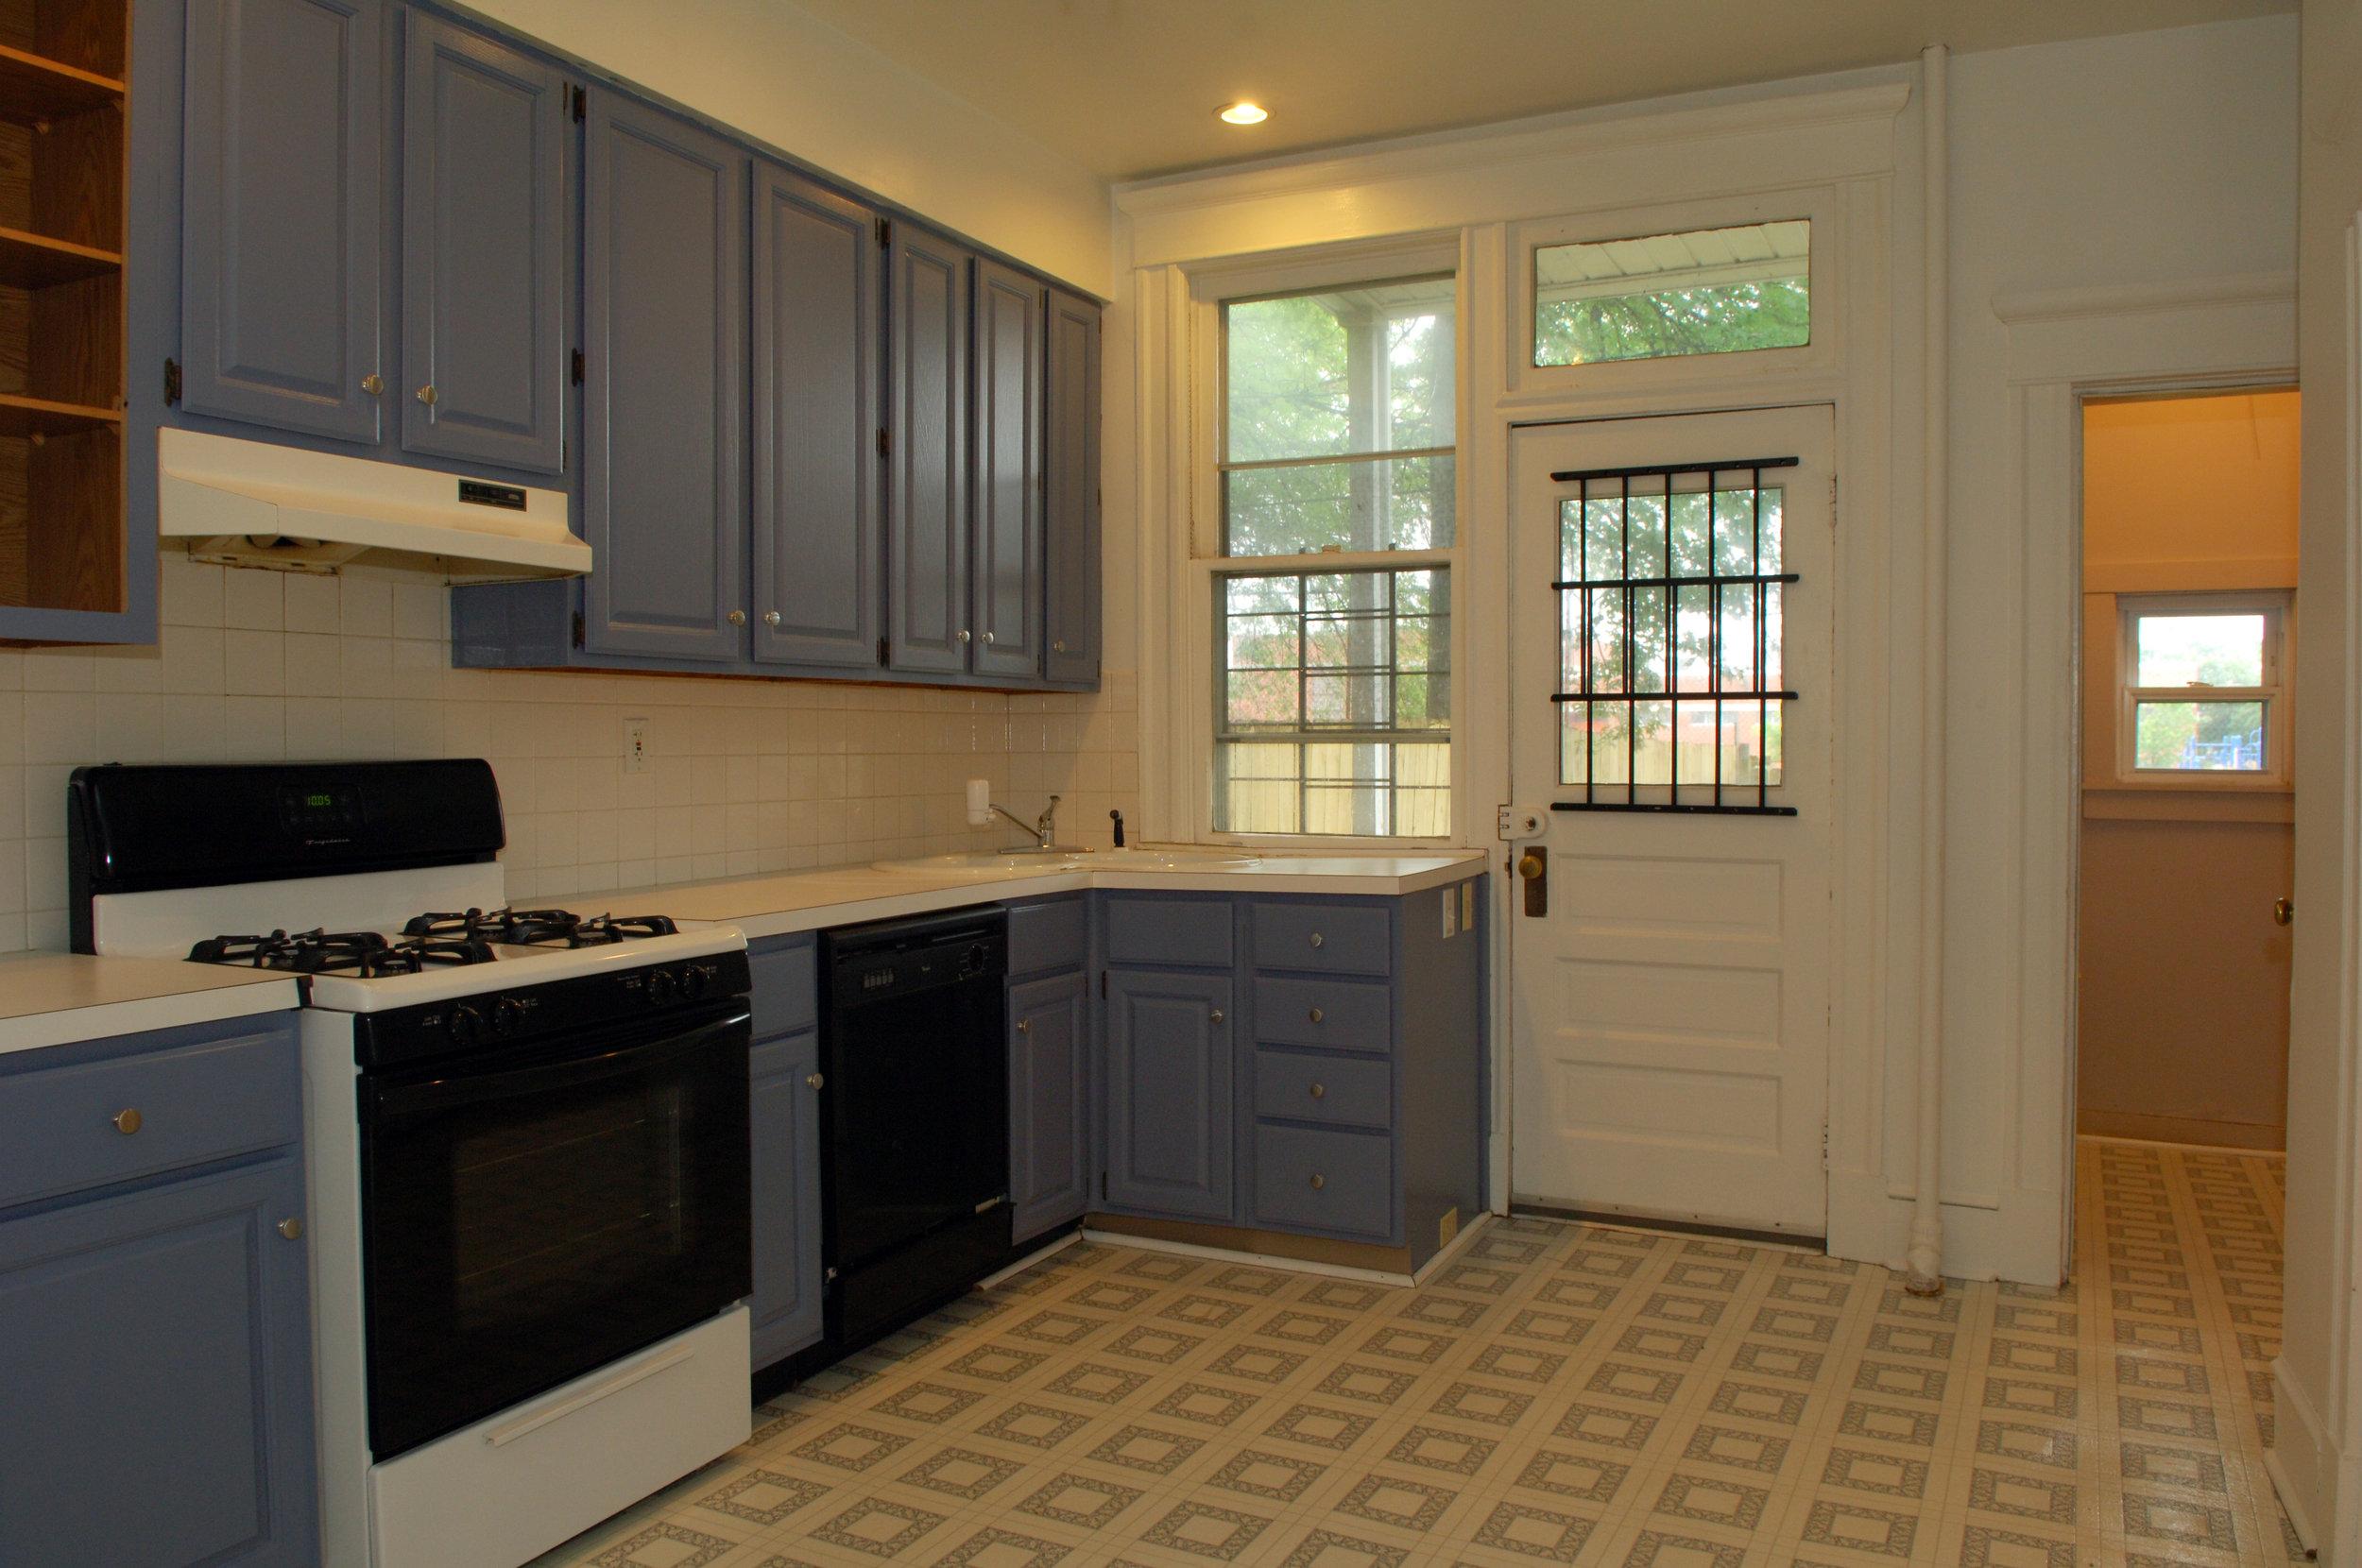 315 kitchen- pantry.JPG